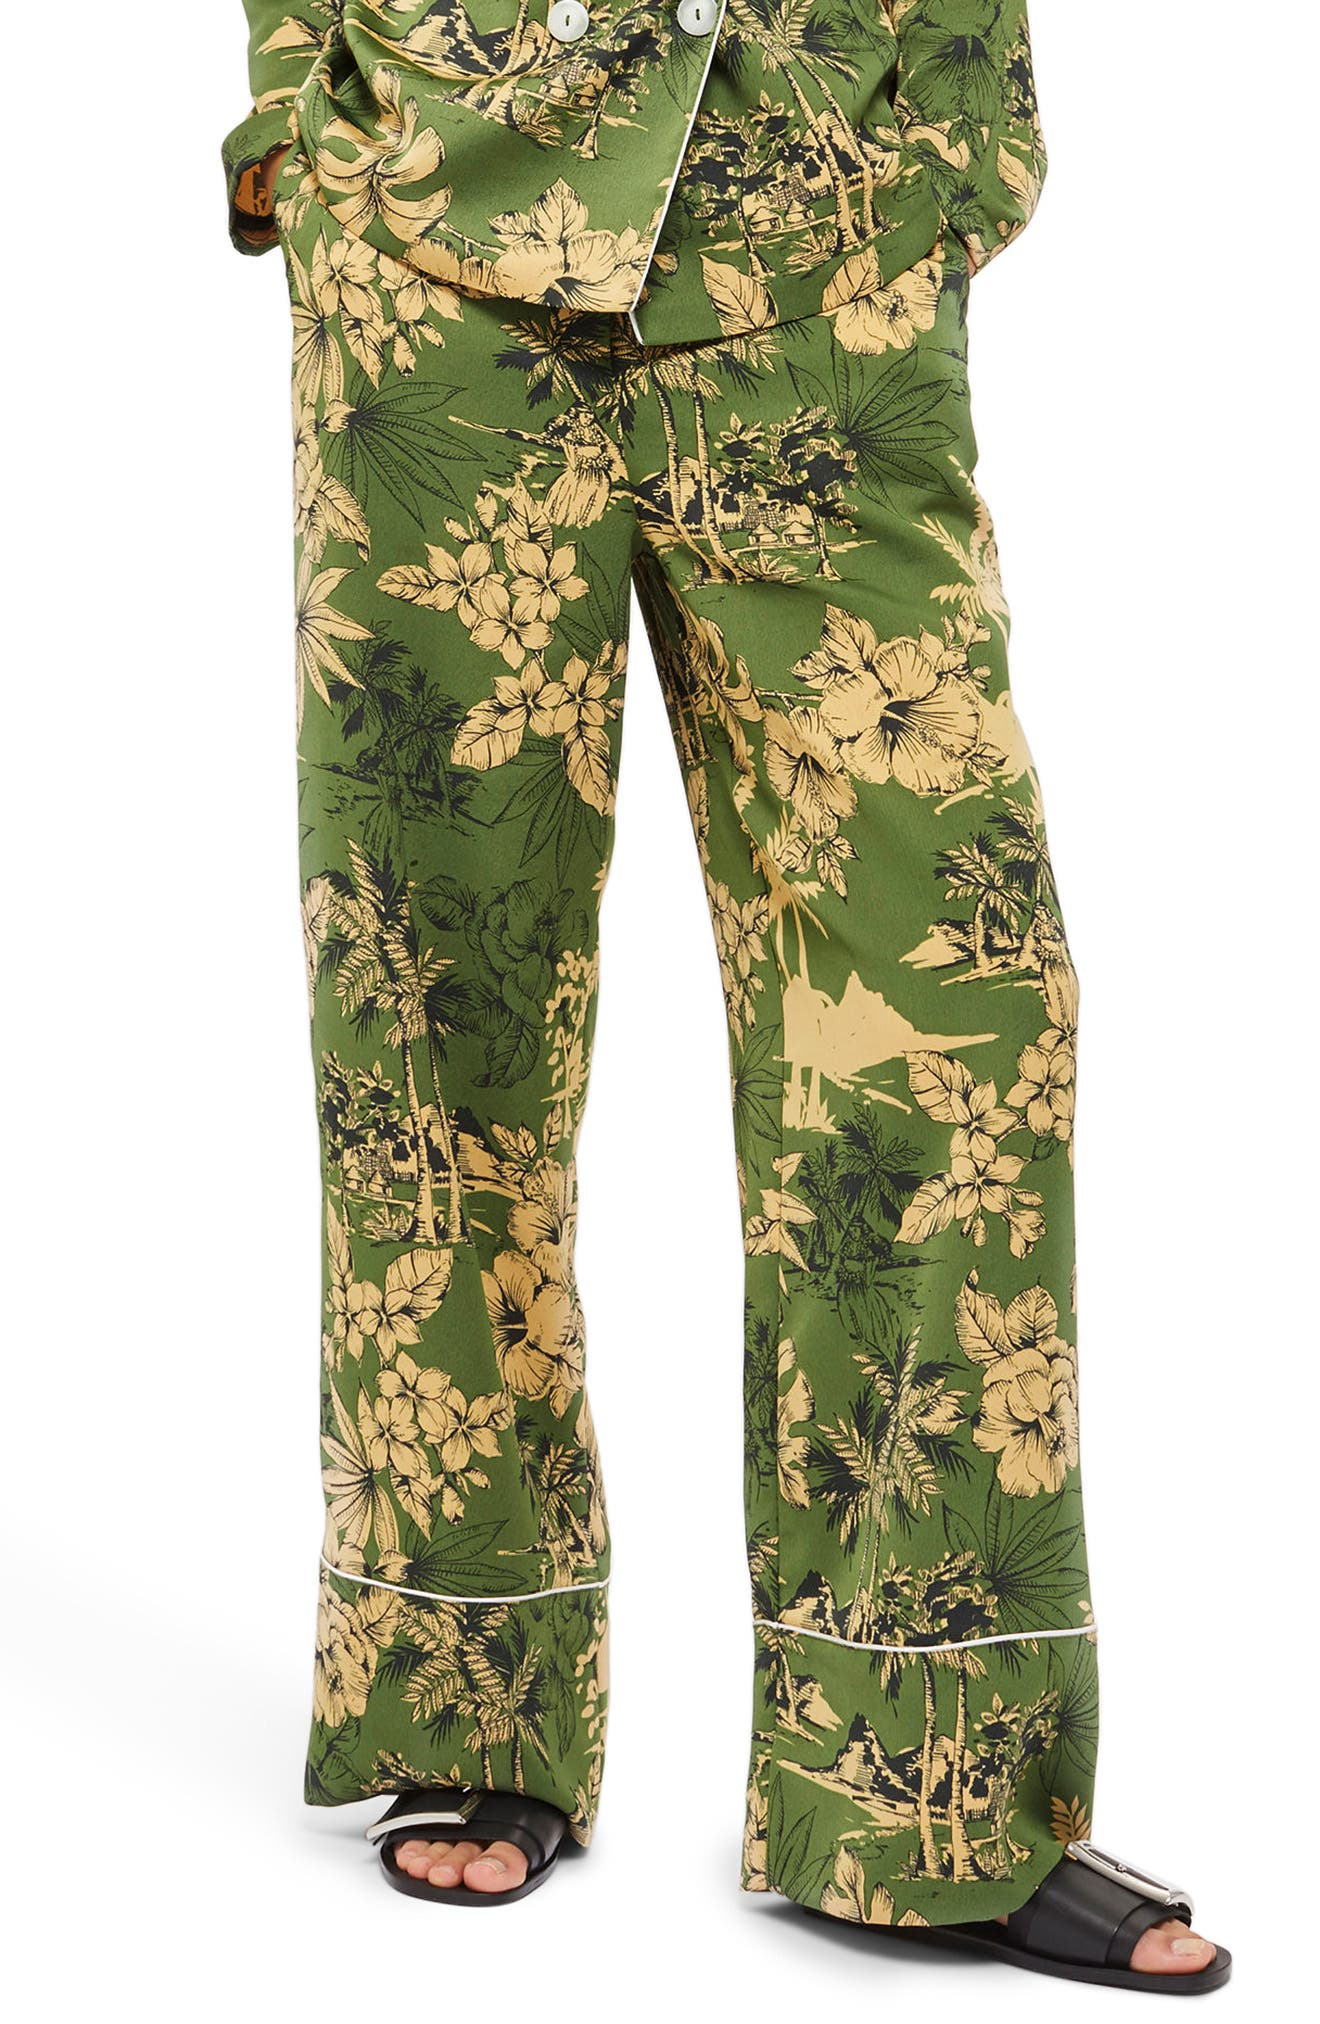 Tropical Pajama Trousers,                             Main thumbnail 1, color,                             Green Multi